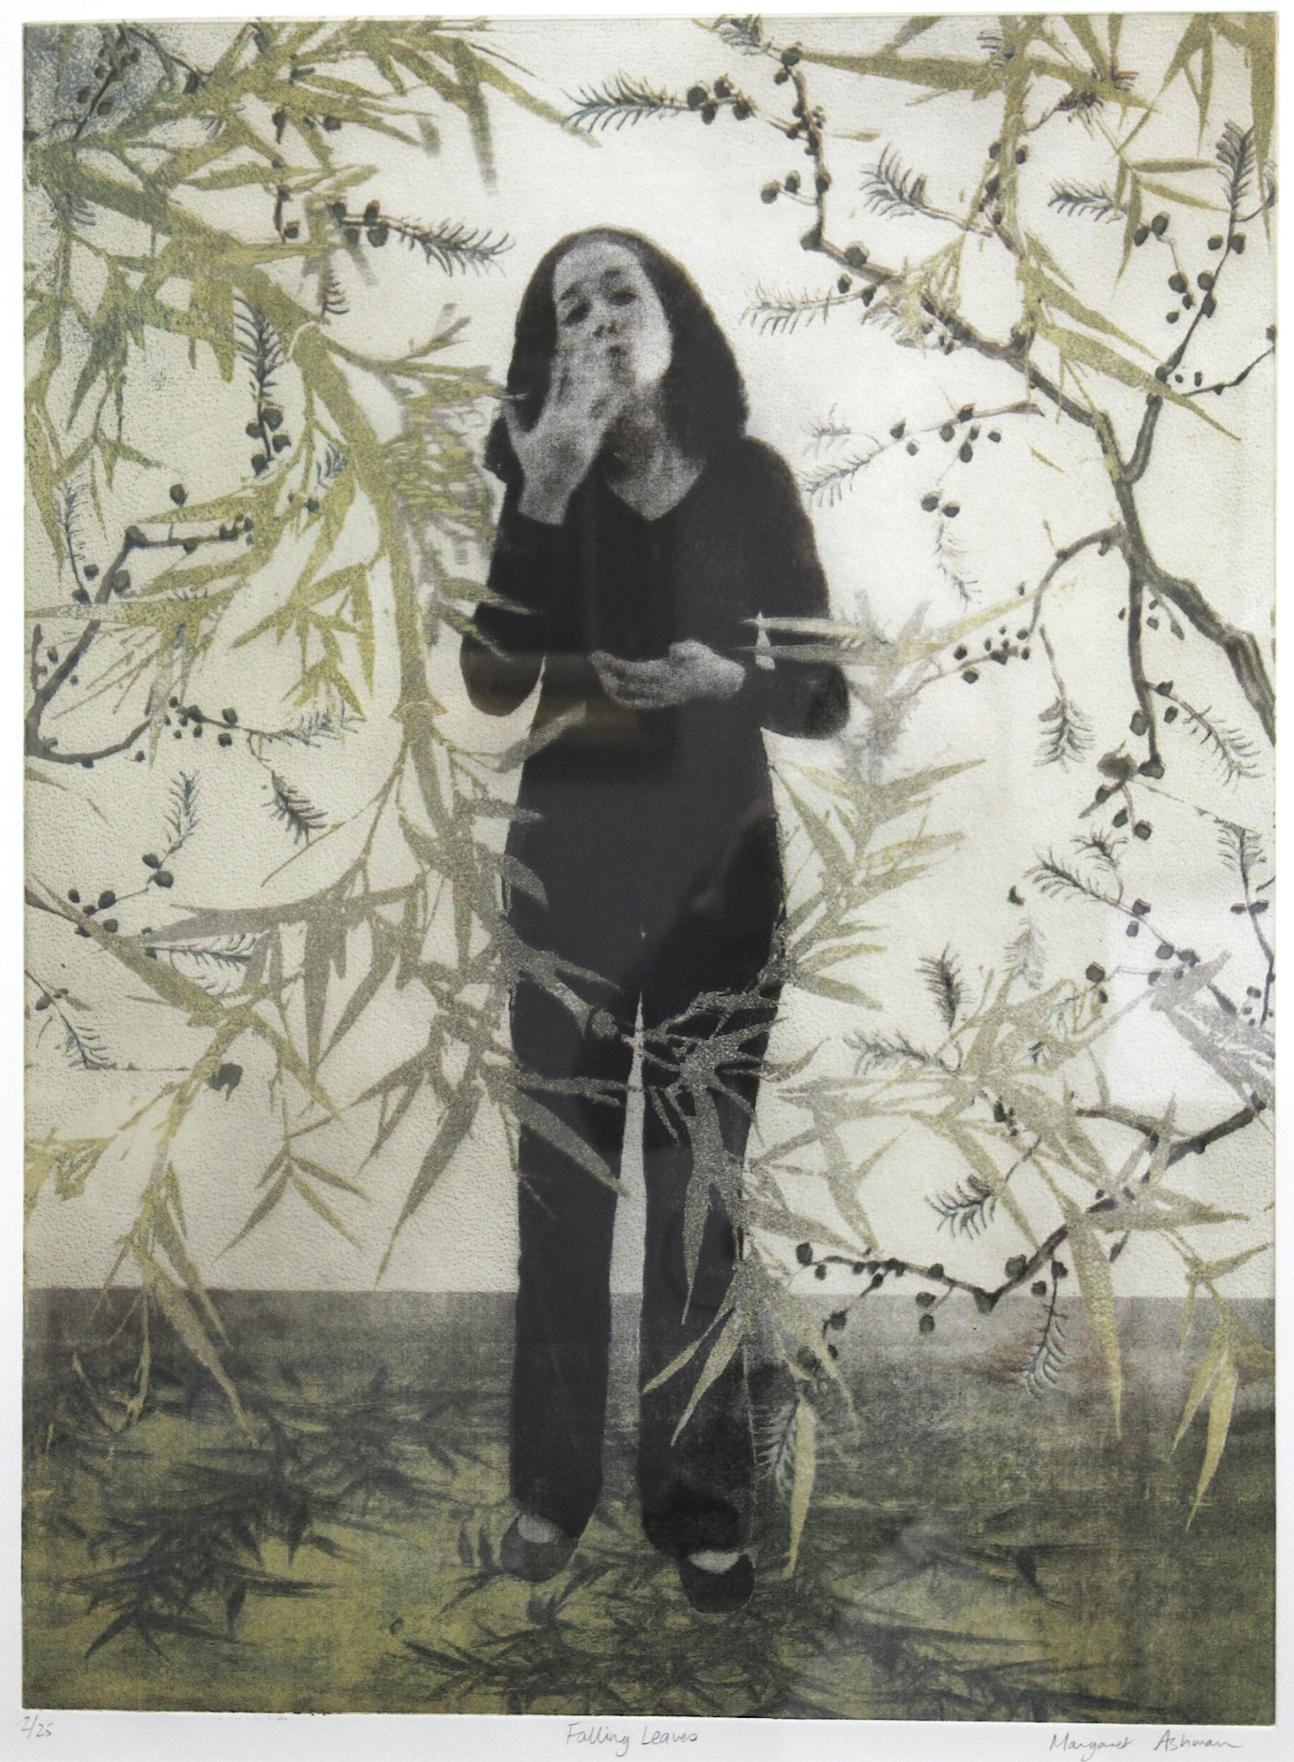 Margaret  Ashman  /  マーガレットアシュマン フォーリングリーブス 銅版画 紙